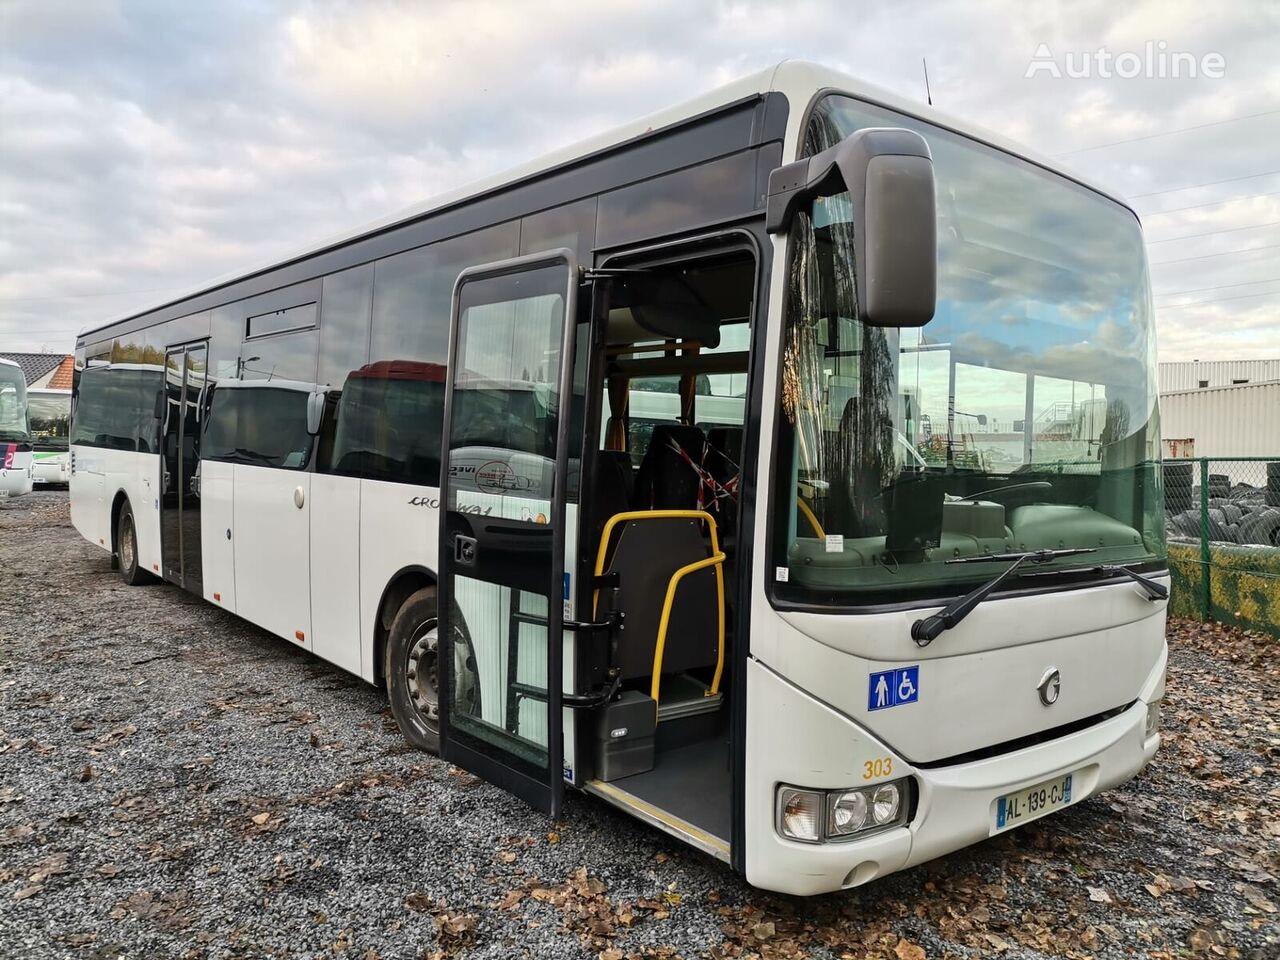 IRISBUS Crossway LE city bus